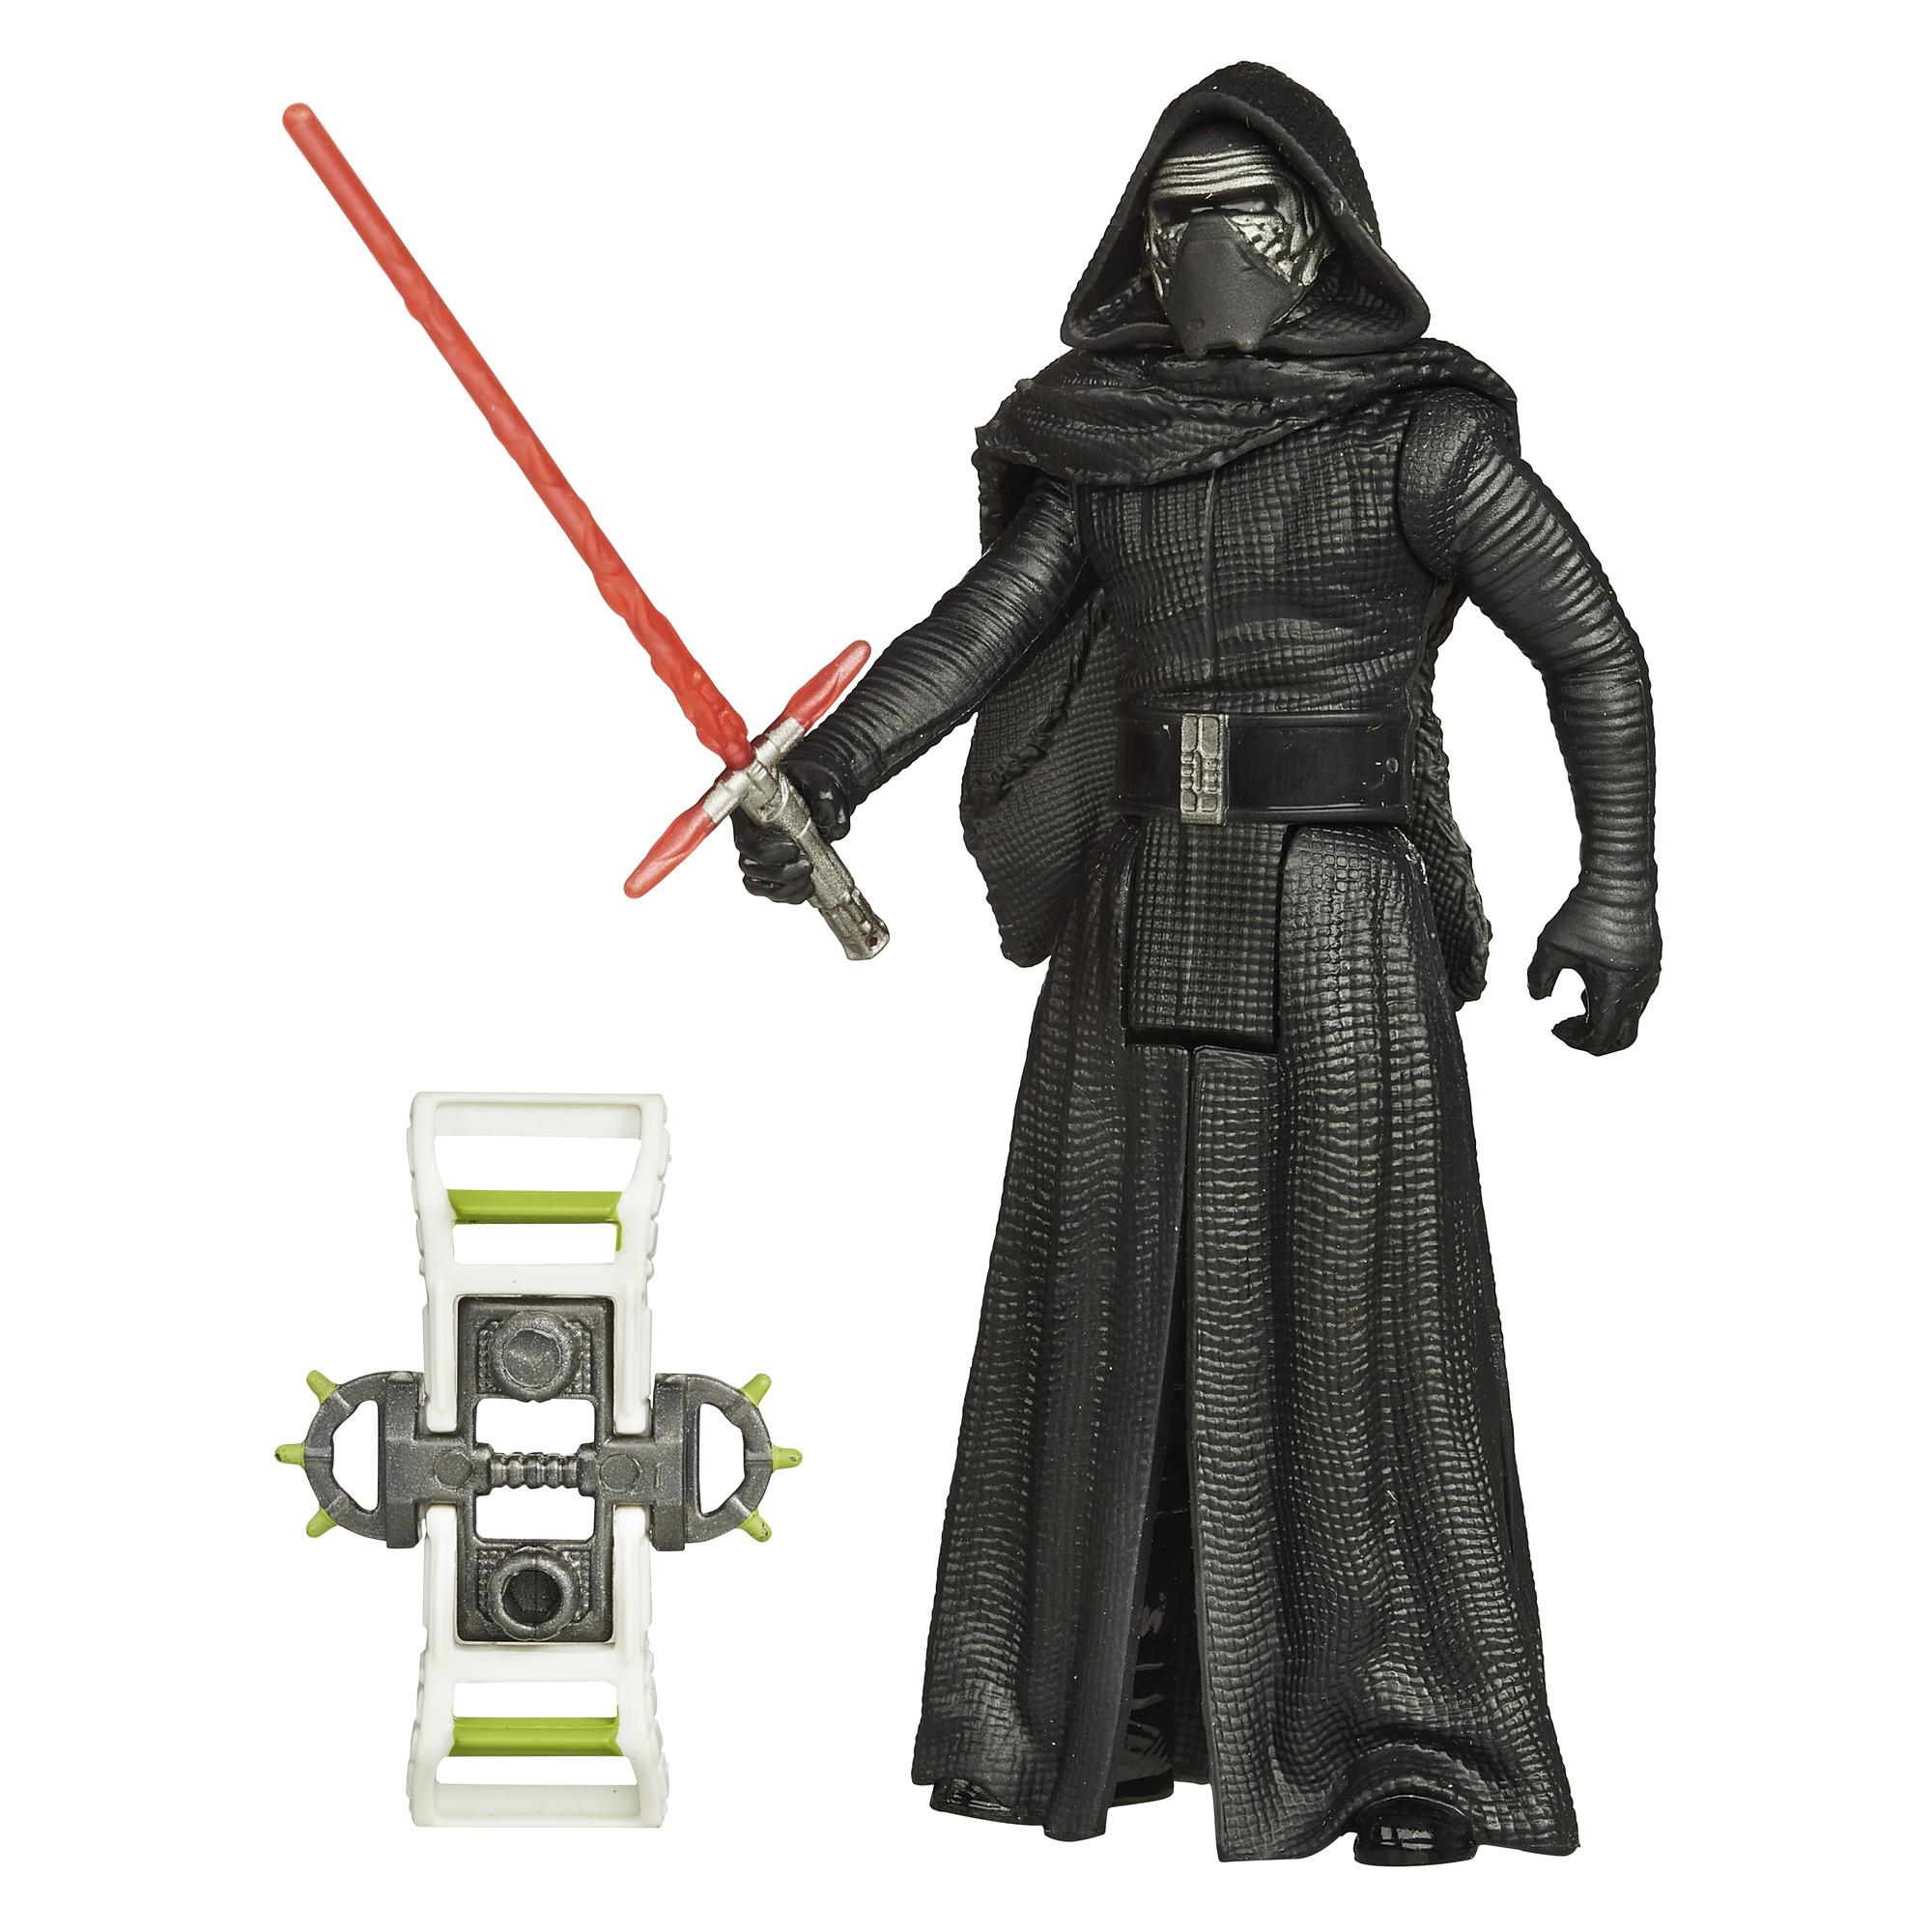 Disney Star Wars The Force Awakens 3.75-Inch Figure Forest Mission Kylo Ren PartNumber: 004W007273289002P KsnValue: 004W007273289002 MfgPartNumber: B3446AS00